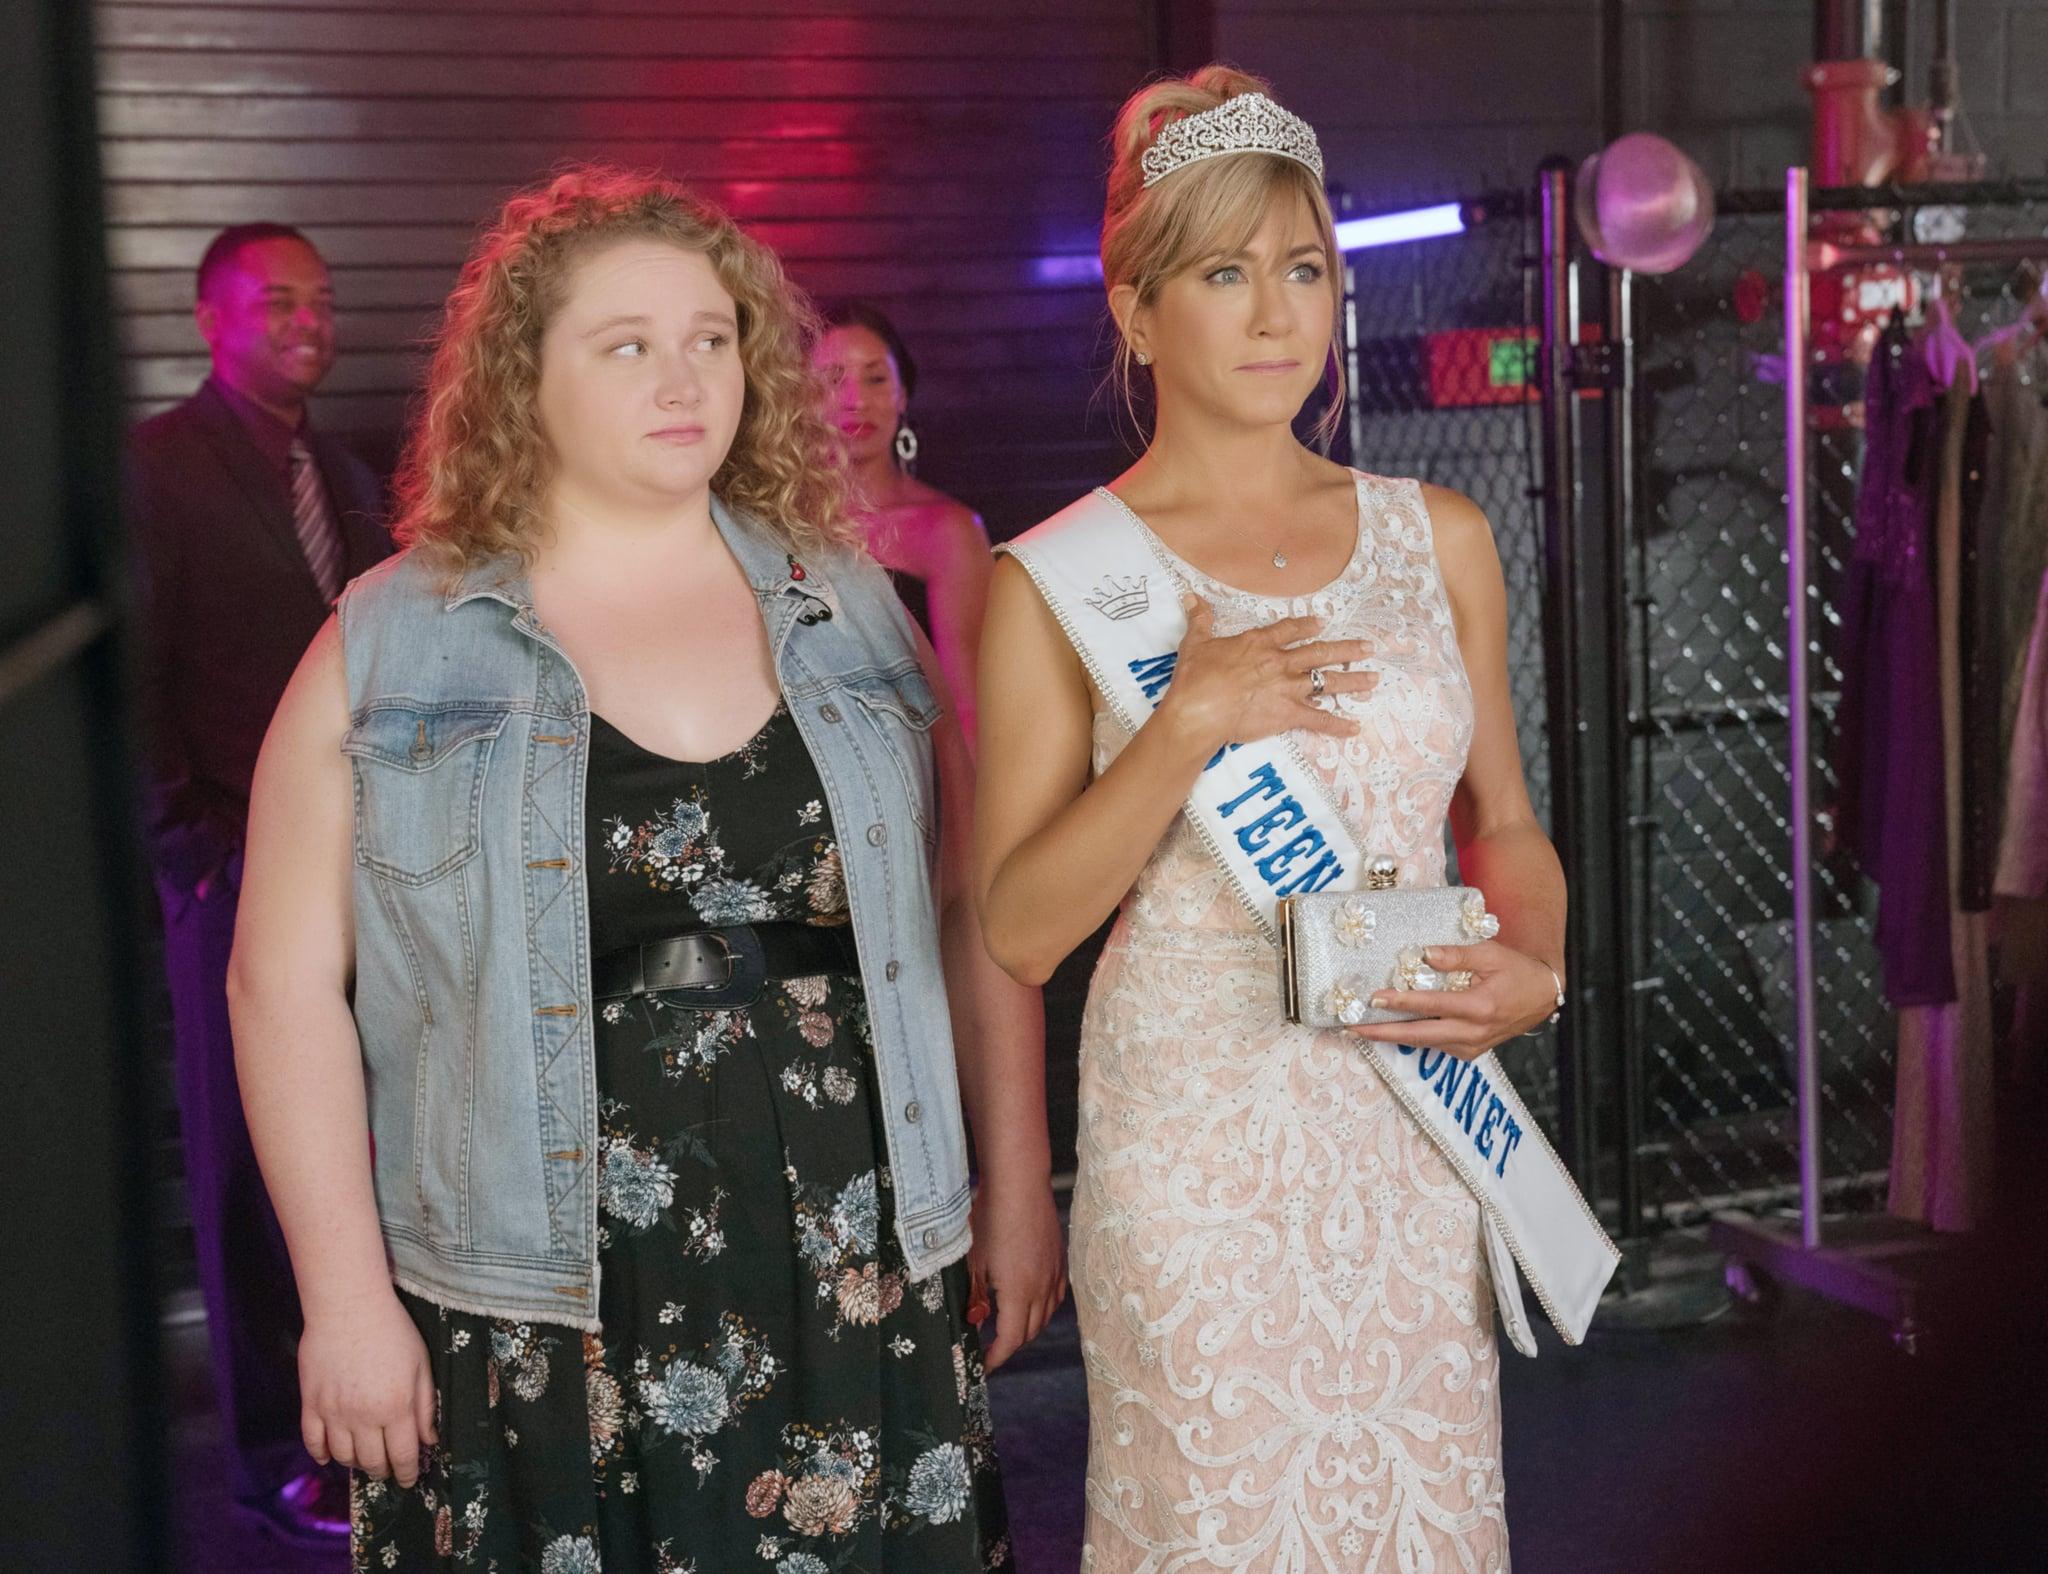 DUMPLIN', from left: Danielle Macdonald, Jennifer Aniston, 2018. ph: Bob Mahoney /  Netflix /Courtesy Everett Collection